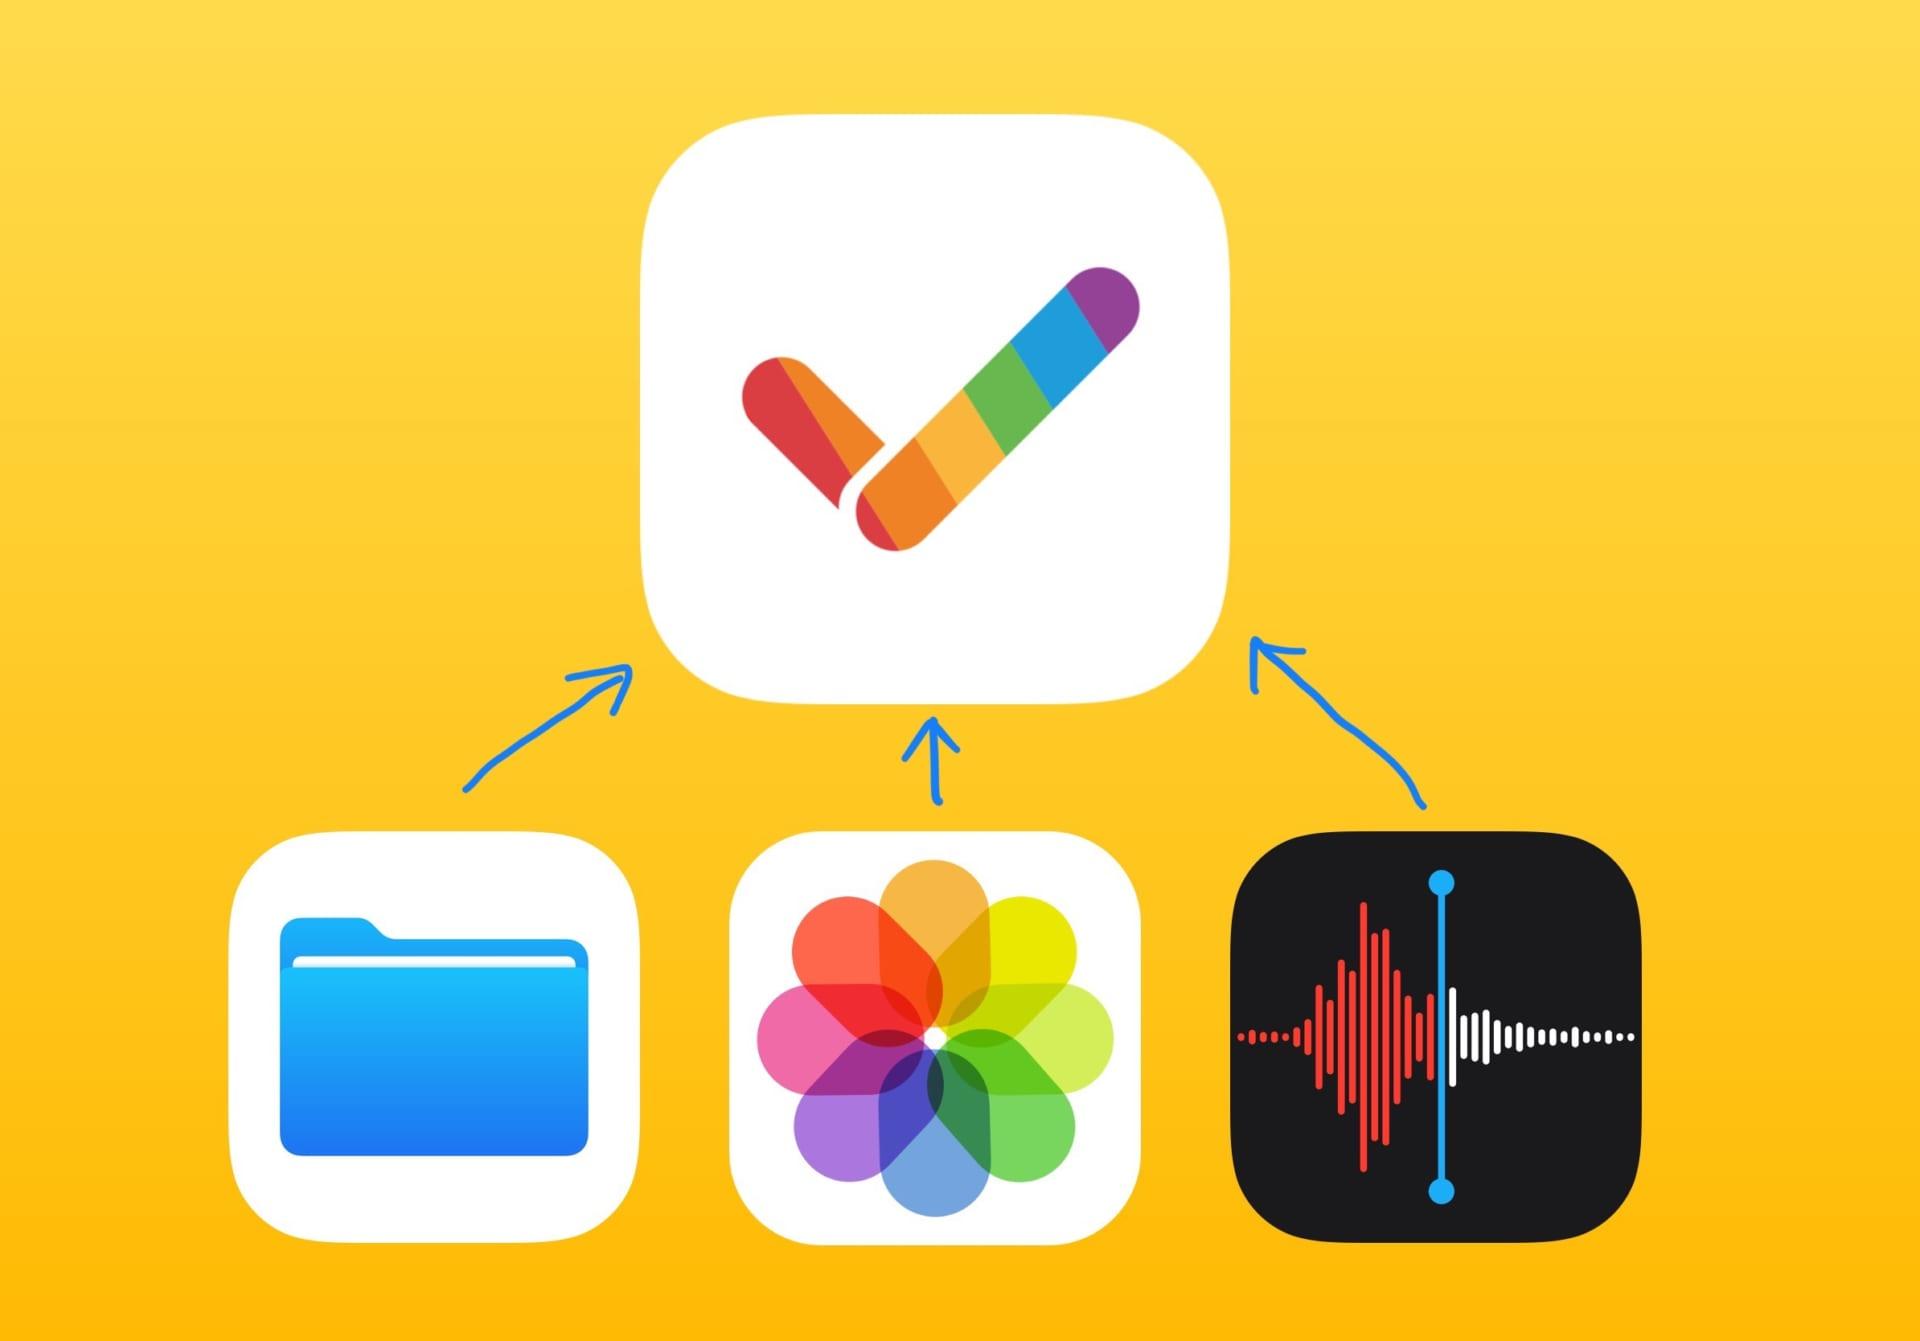 GoodTaskで画像や音声やファイルがタスクに添付できるようになりました。